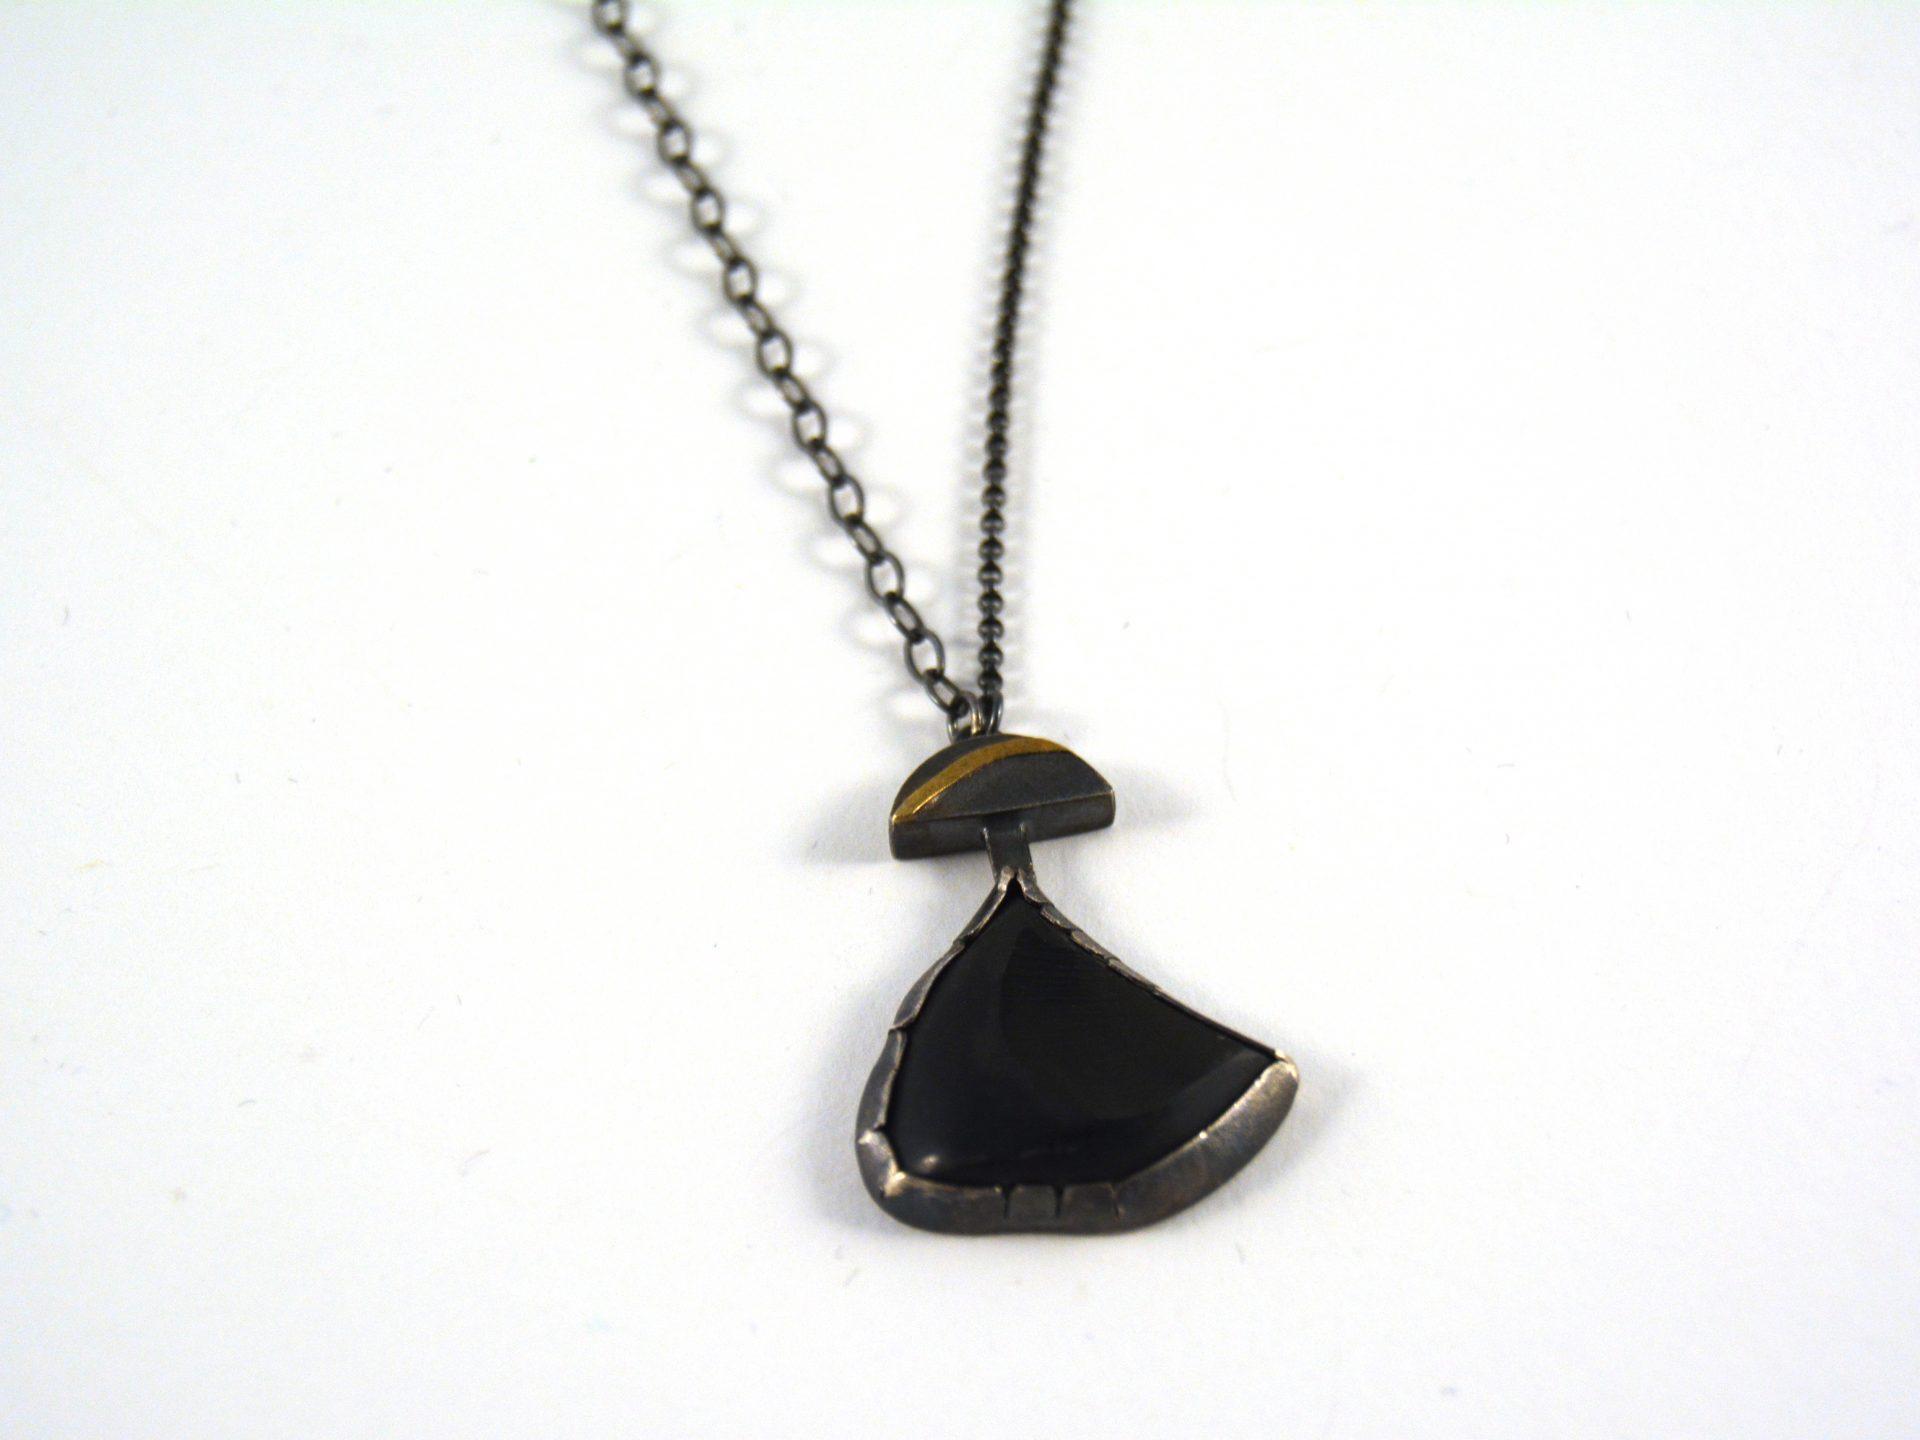 Janine decresenzo obsidian pendant necklace arrowmont school of janine decresenzo obsidian pendant necklace aloadofball Image collections